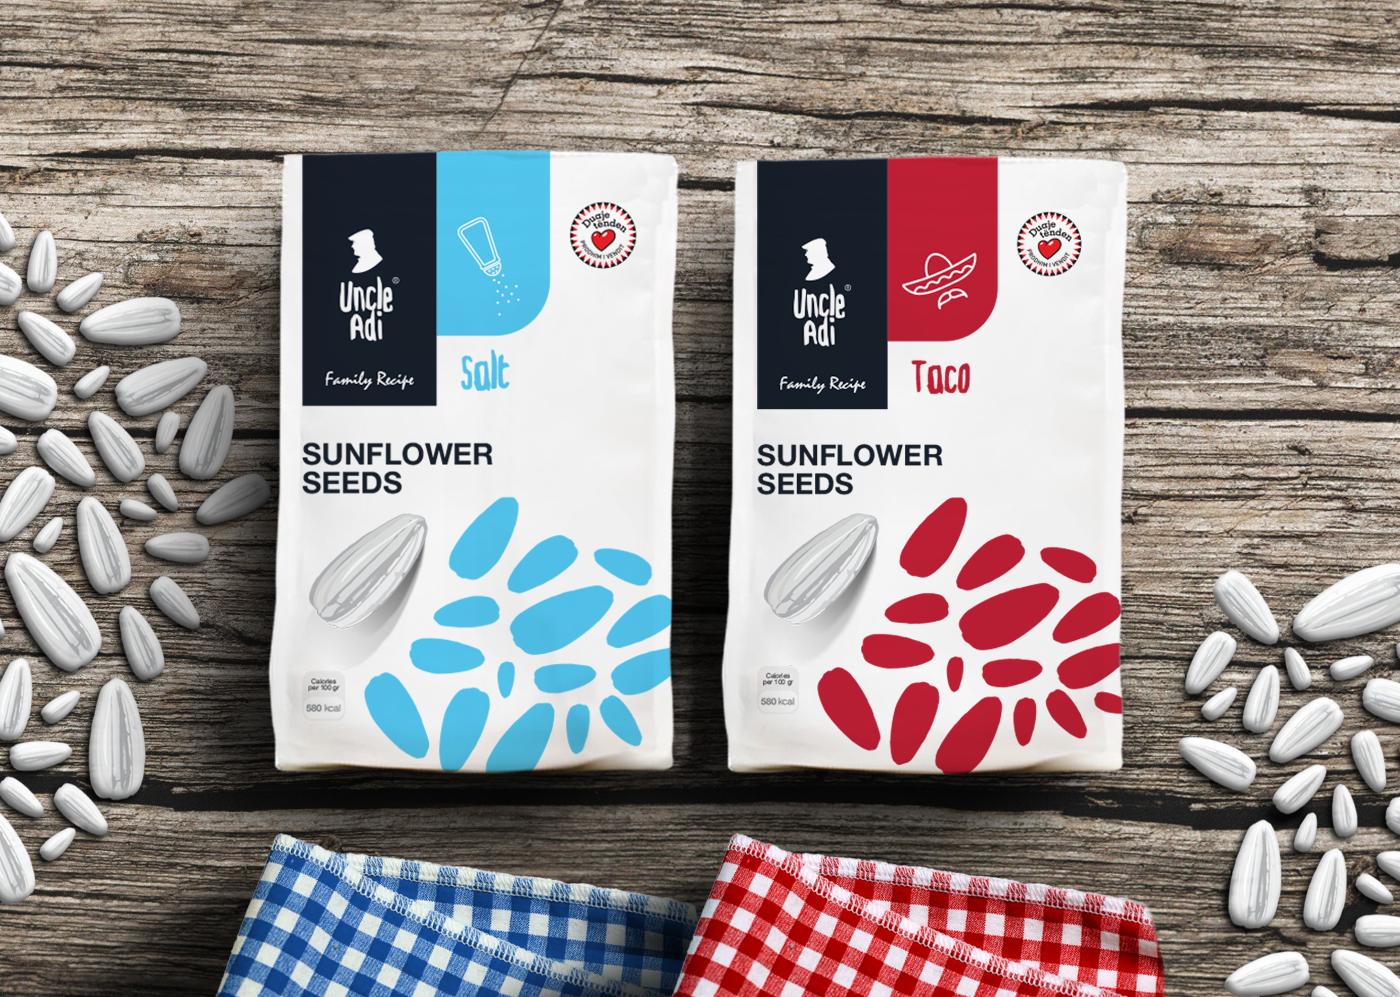 UNCLE ADI - Branding and Packaging Design